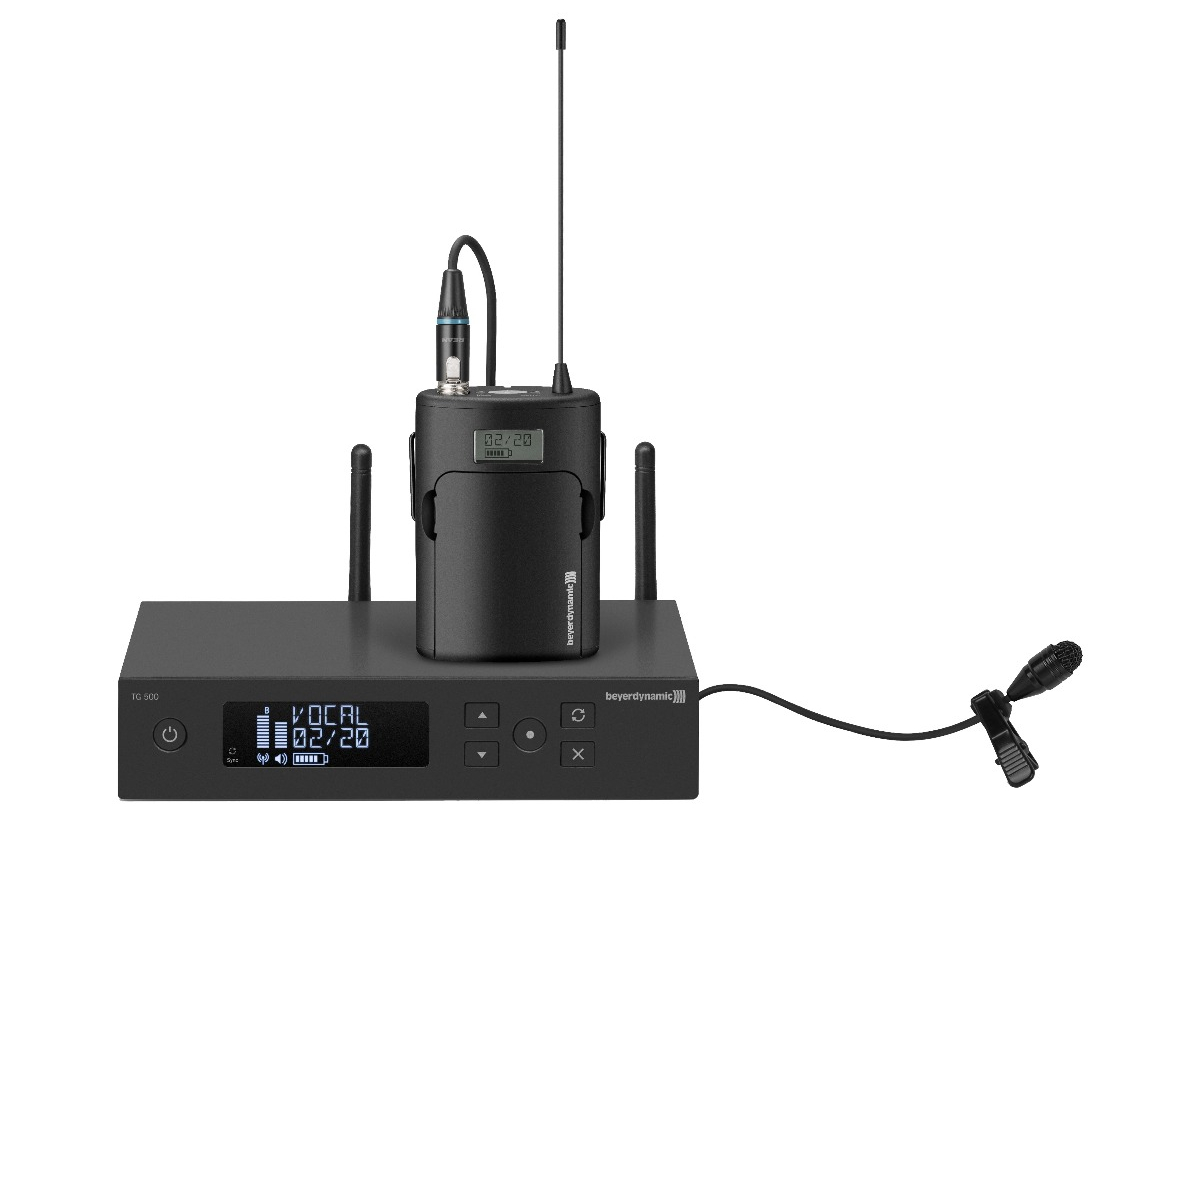 Wireless headset microphone set - beyerdynamic TG 534